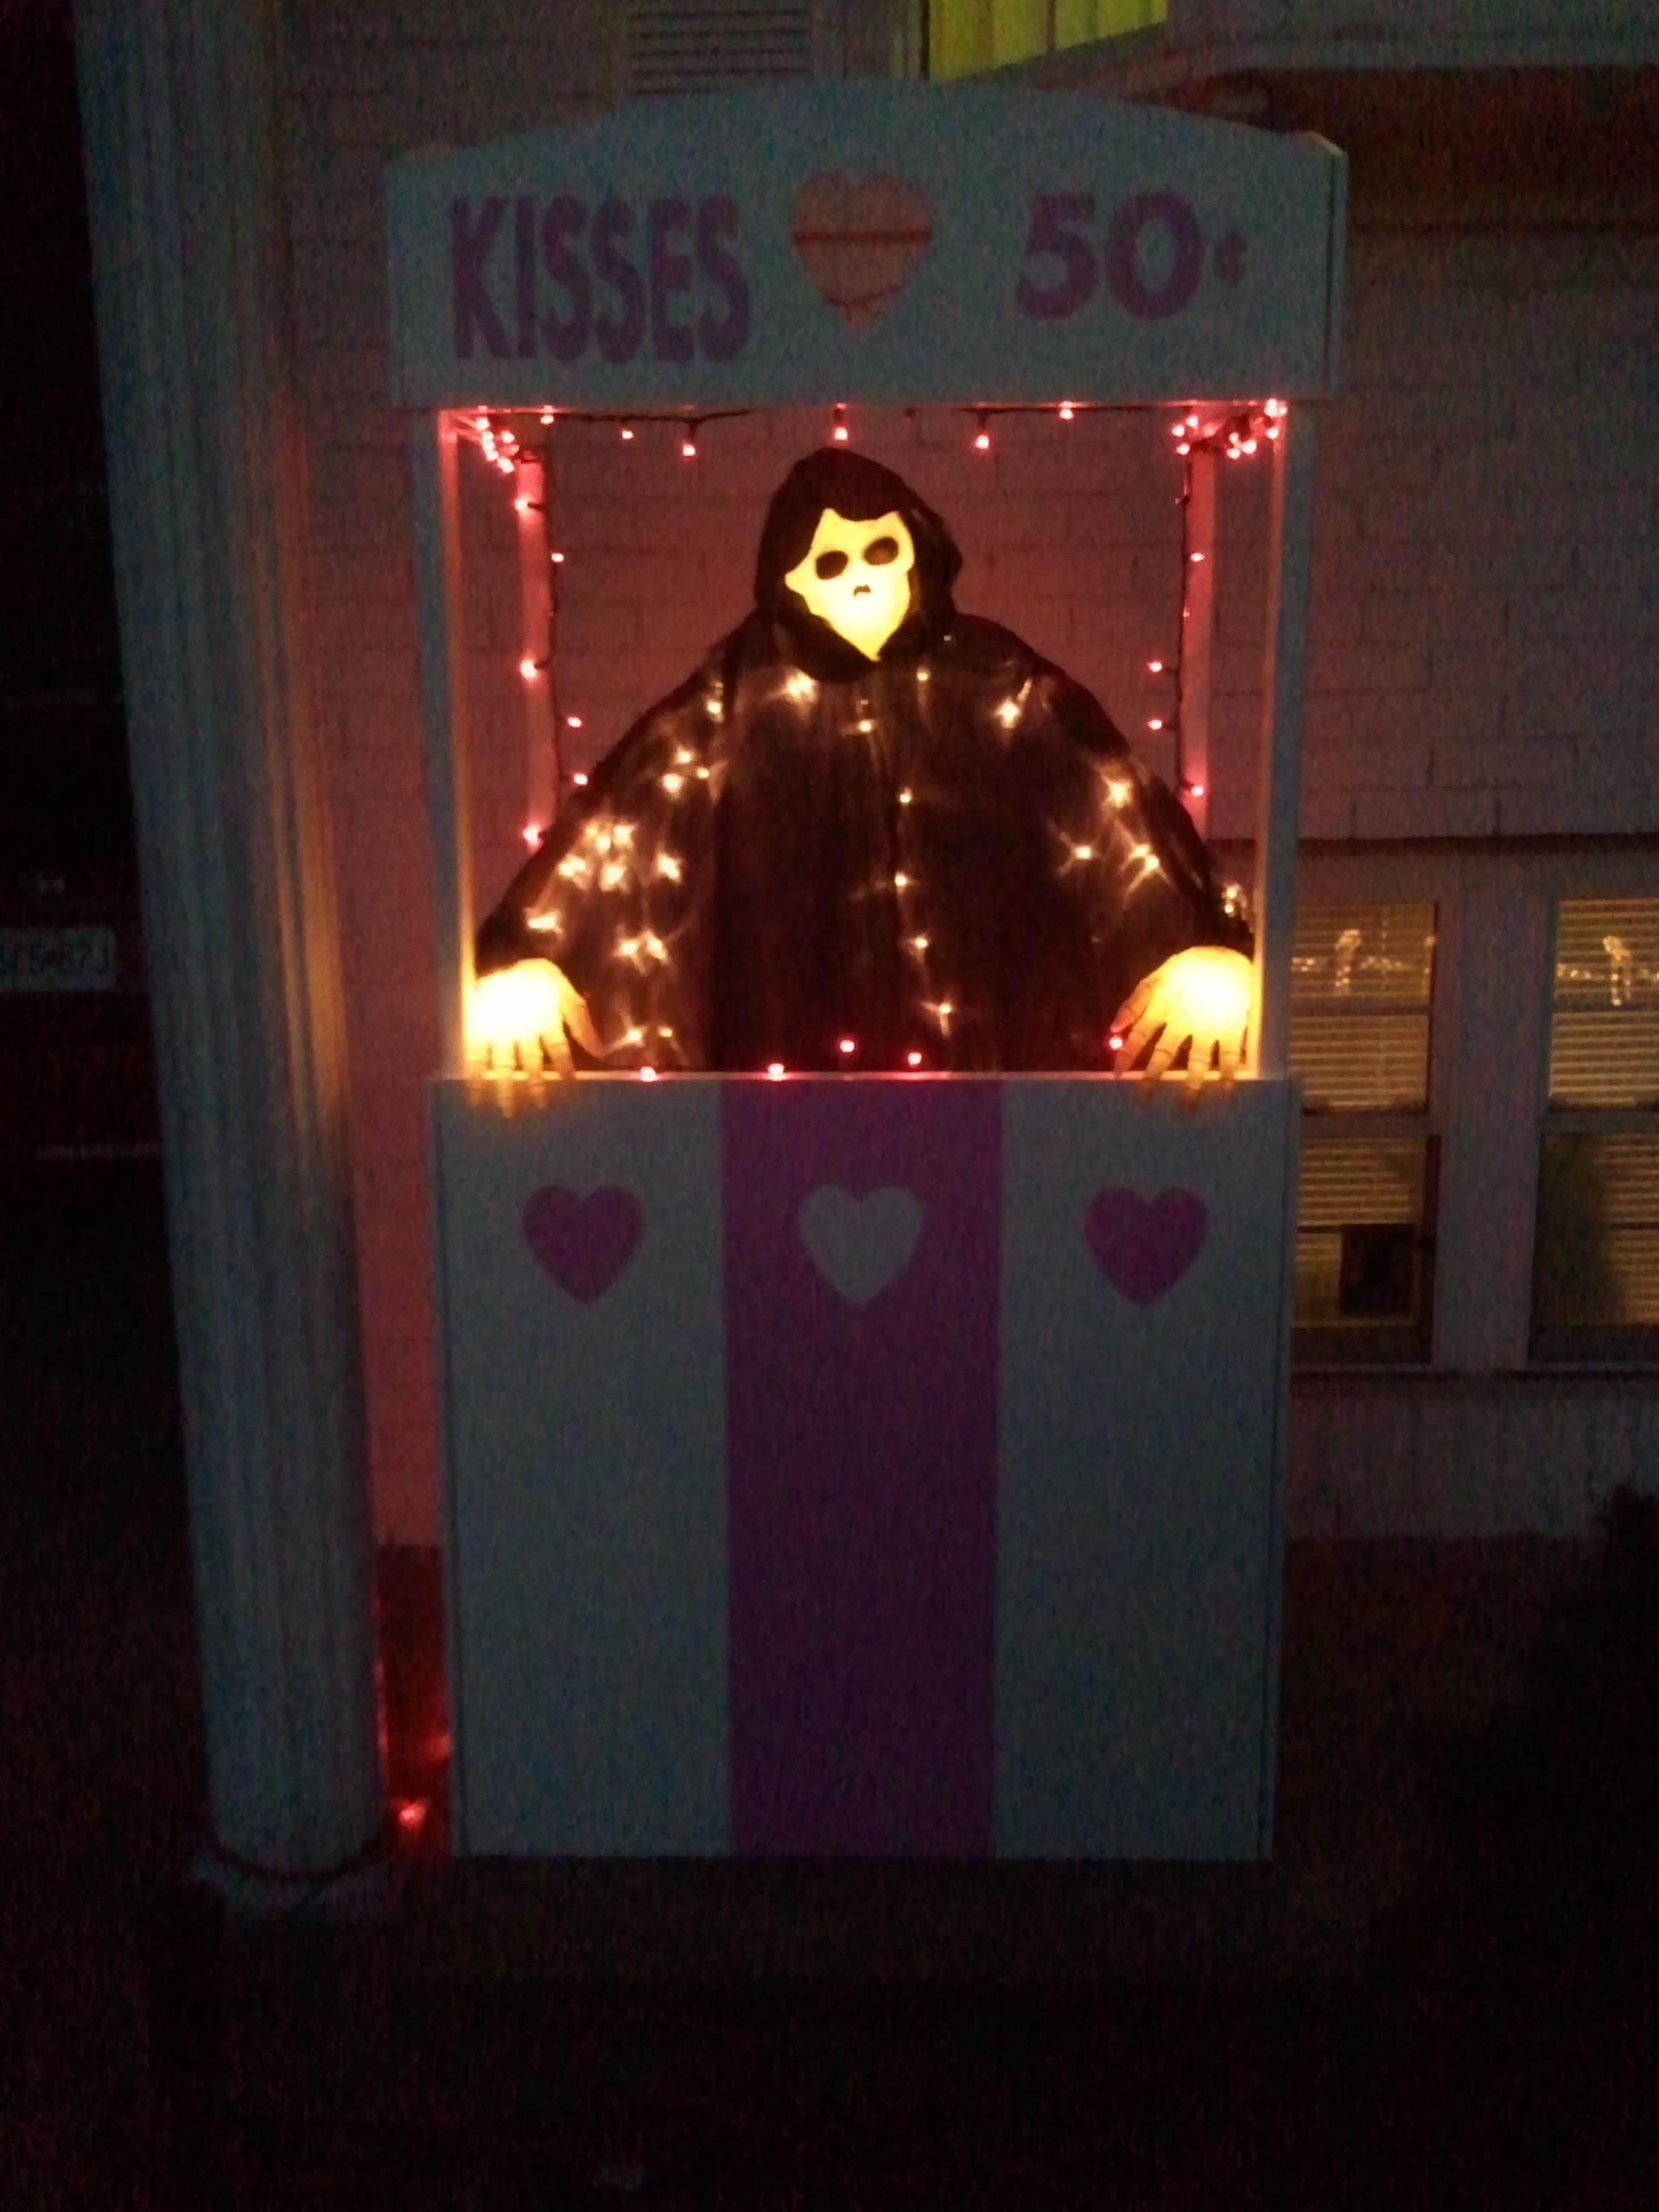 Grim Reaper Kissing Booth The Geek Woodworker